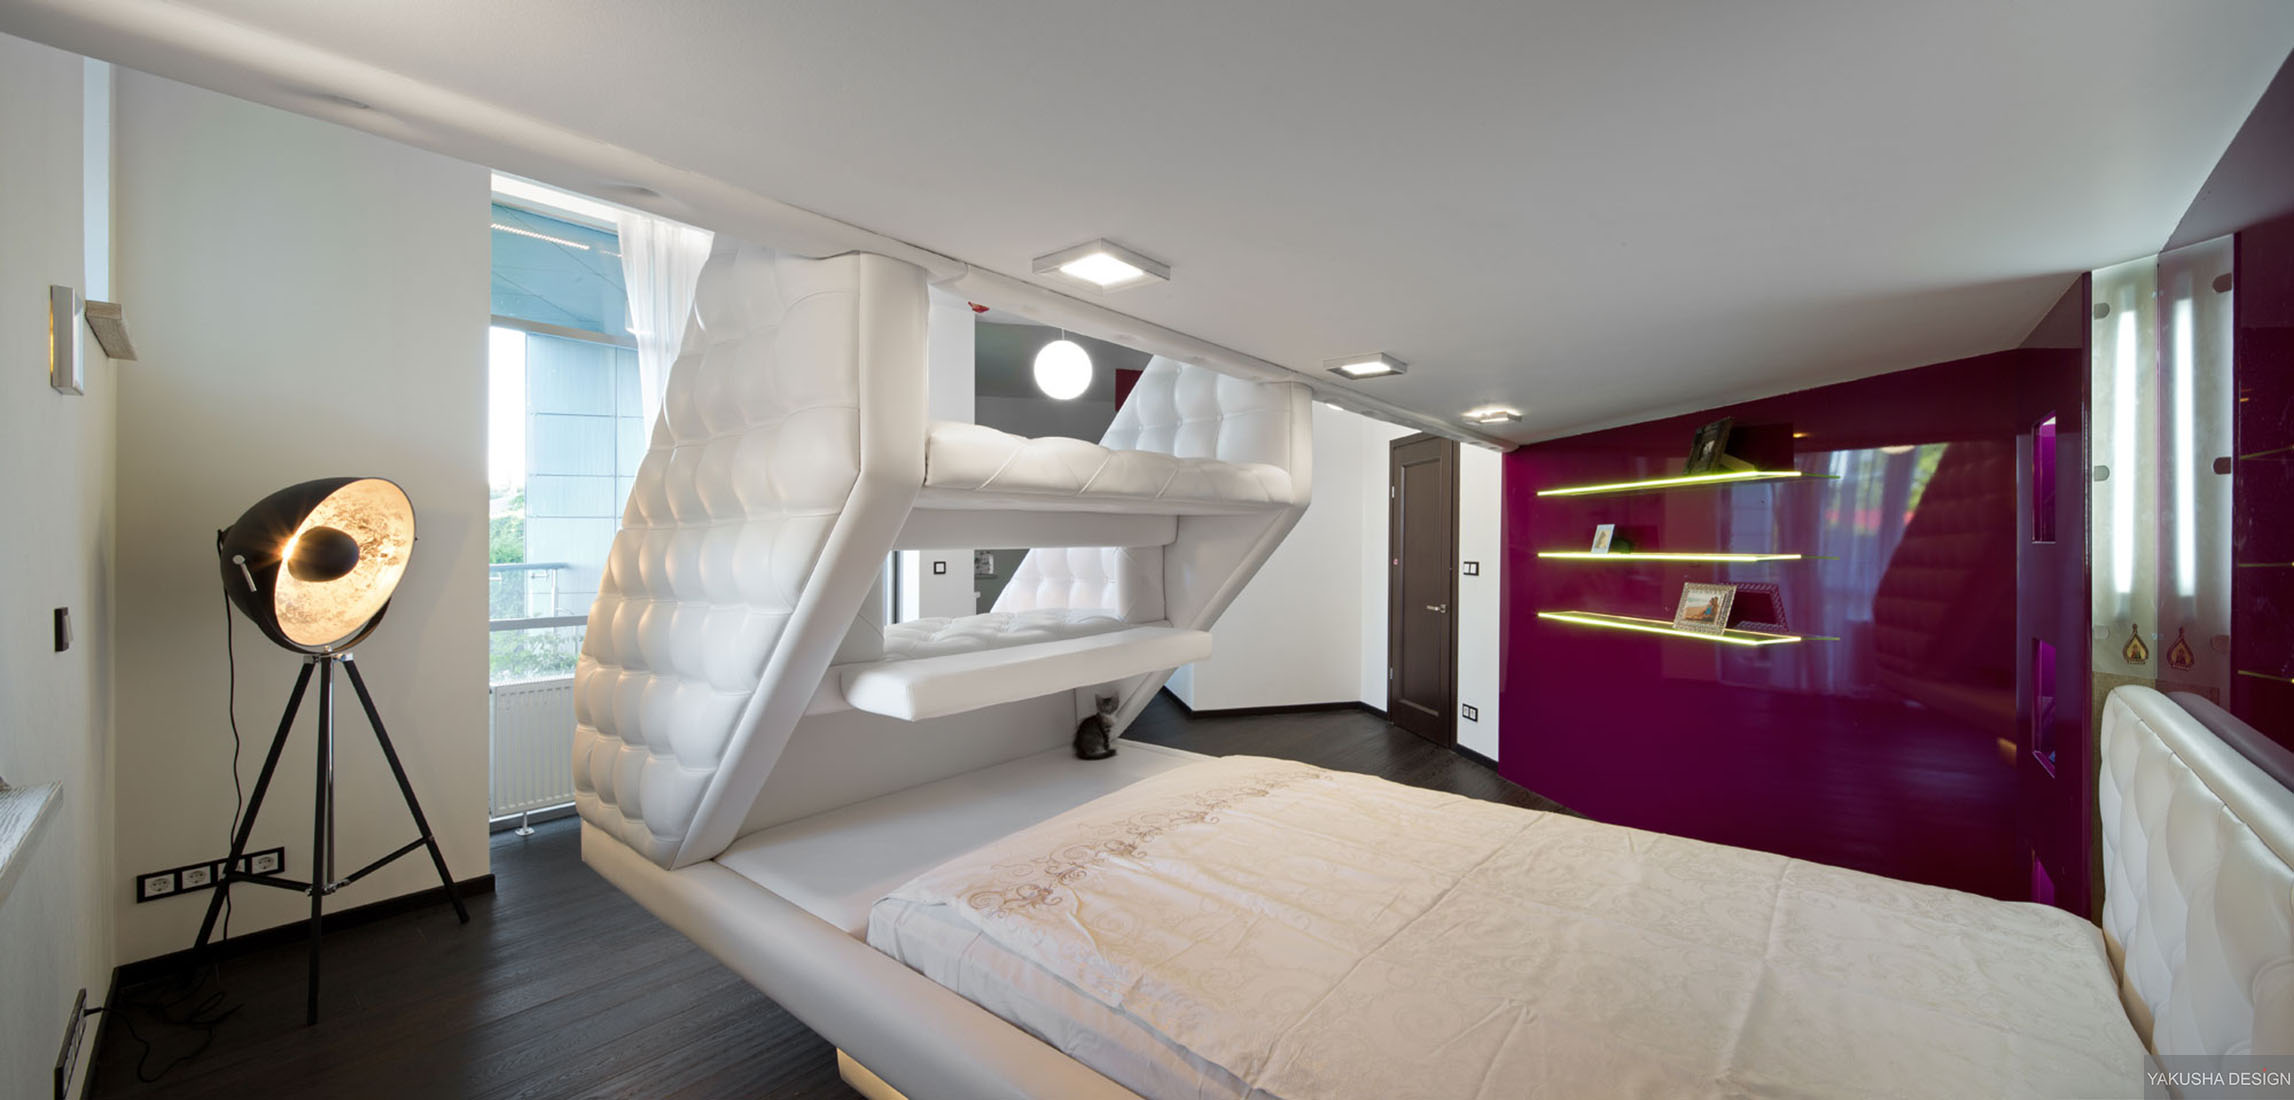 Split Level Plush Futuristic Retro Bedroom In White With Red Part 74